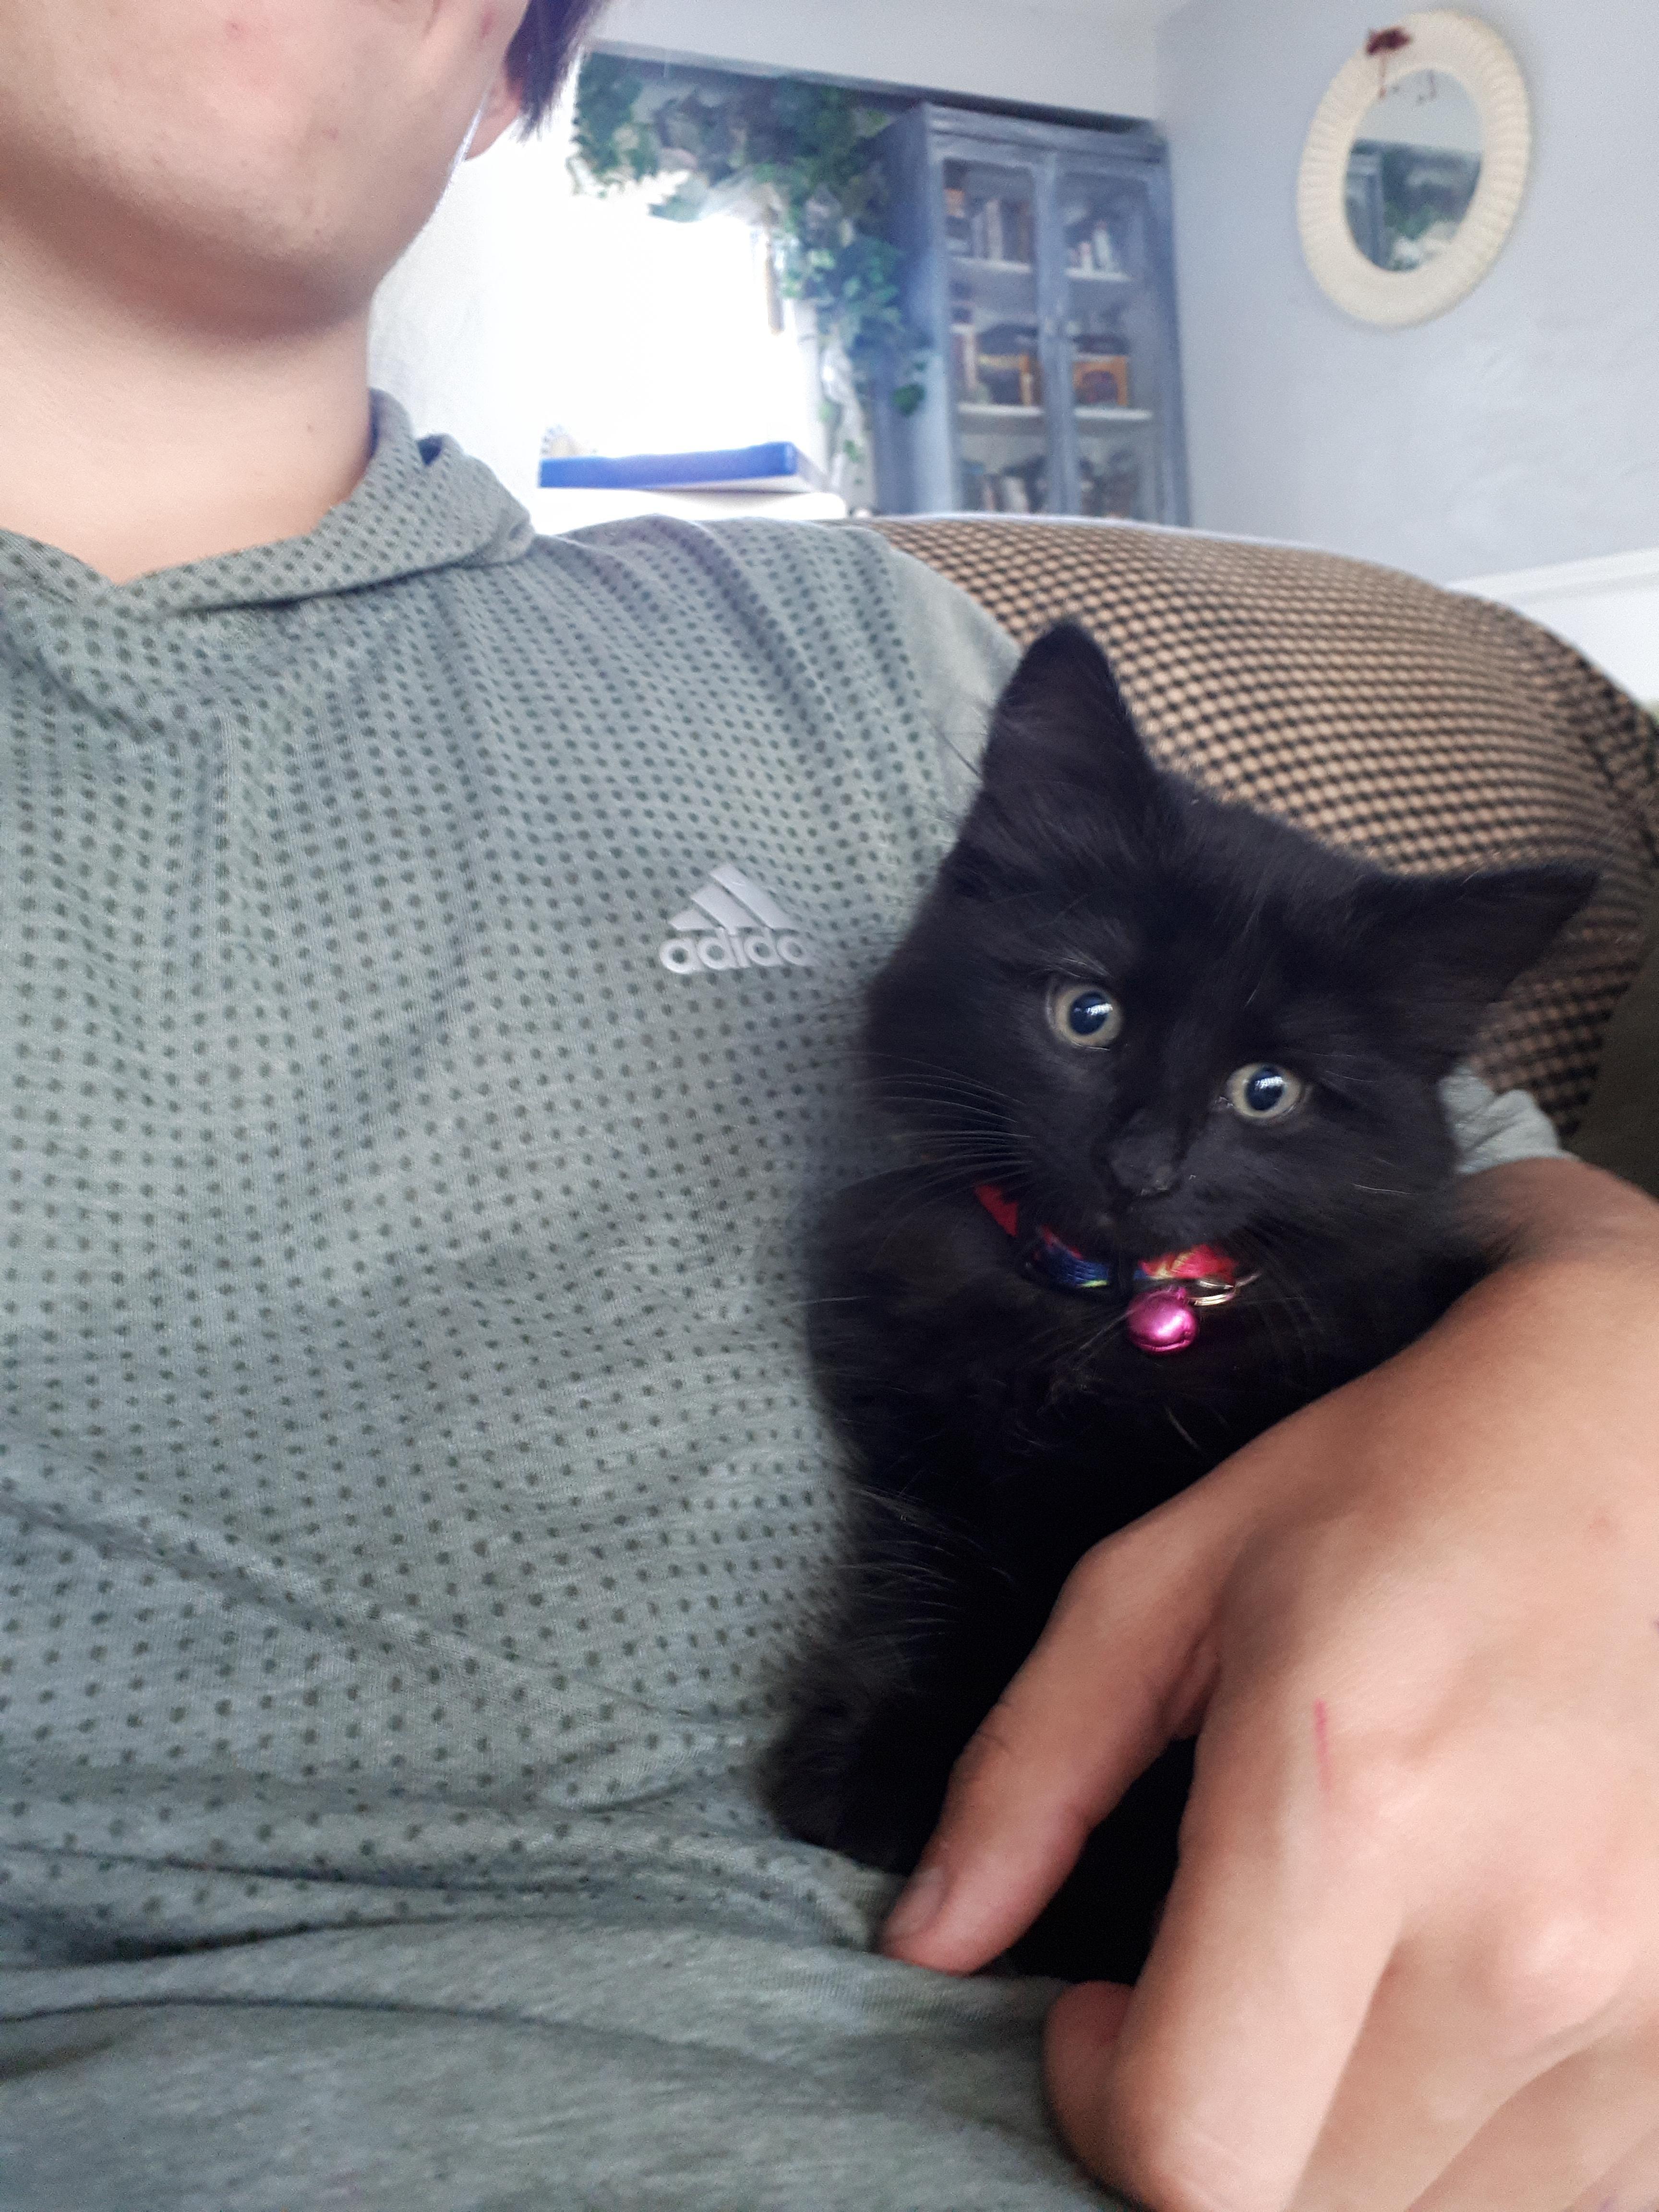 My Kitten Boo The Day We Got Her Https Ift Tt 2rhe2qc Cute Puppies Cats Animals Cats Black Cat Fur Baby Cat